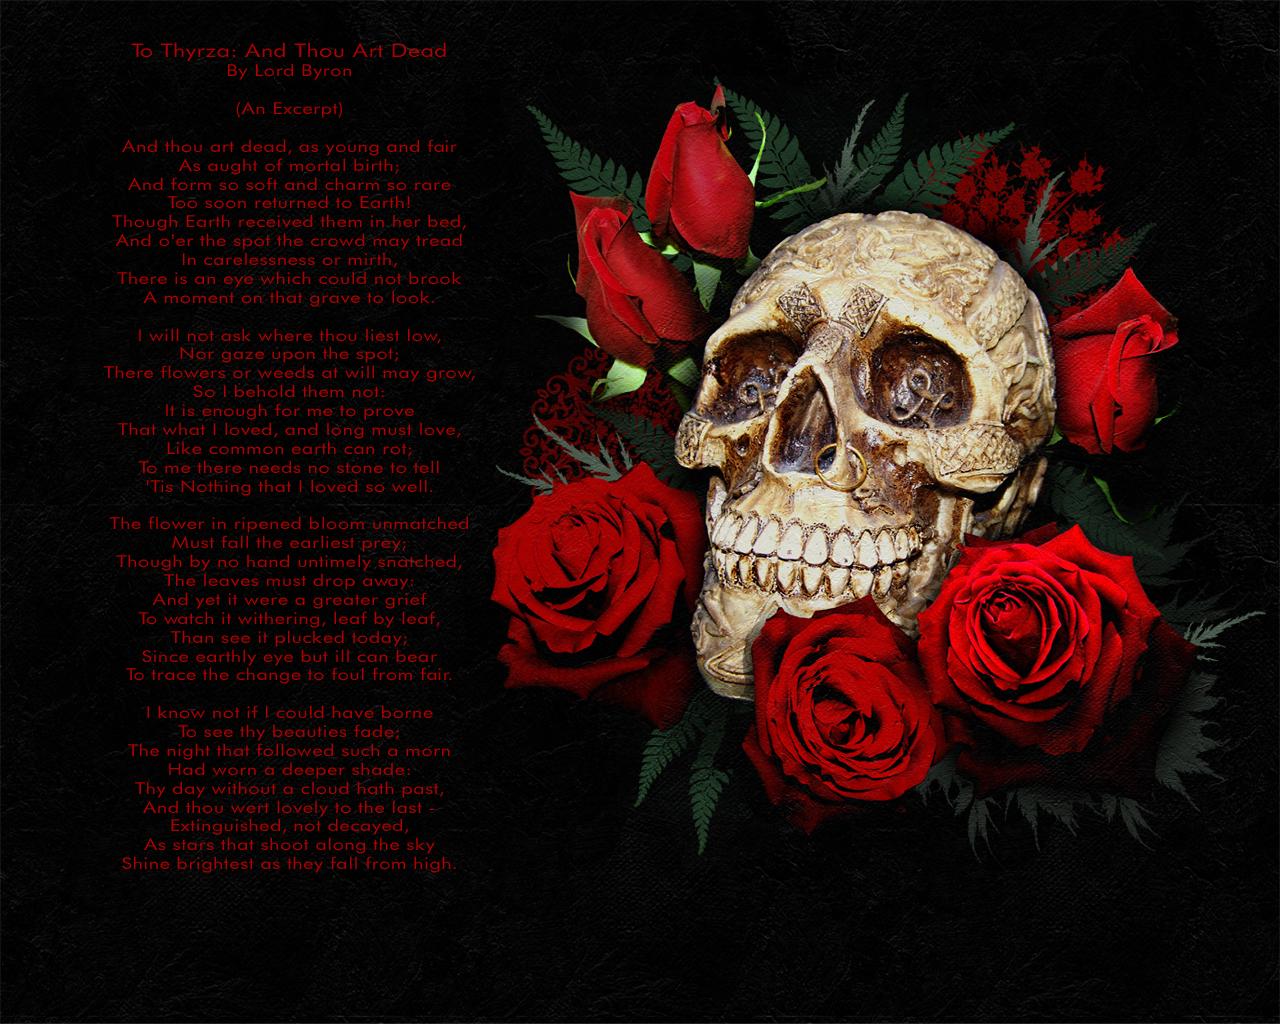 http://4.bp.blogspot.com/-Y2xxL3vyF2c/T9X14dWq3cI/AAAAAAAAANg/-YVSSD1iZlw/s1600/skull-wallpaper-desktop-3.jpg